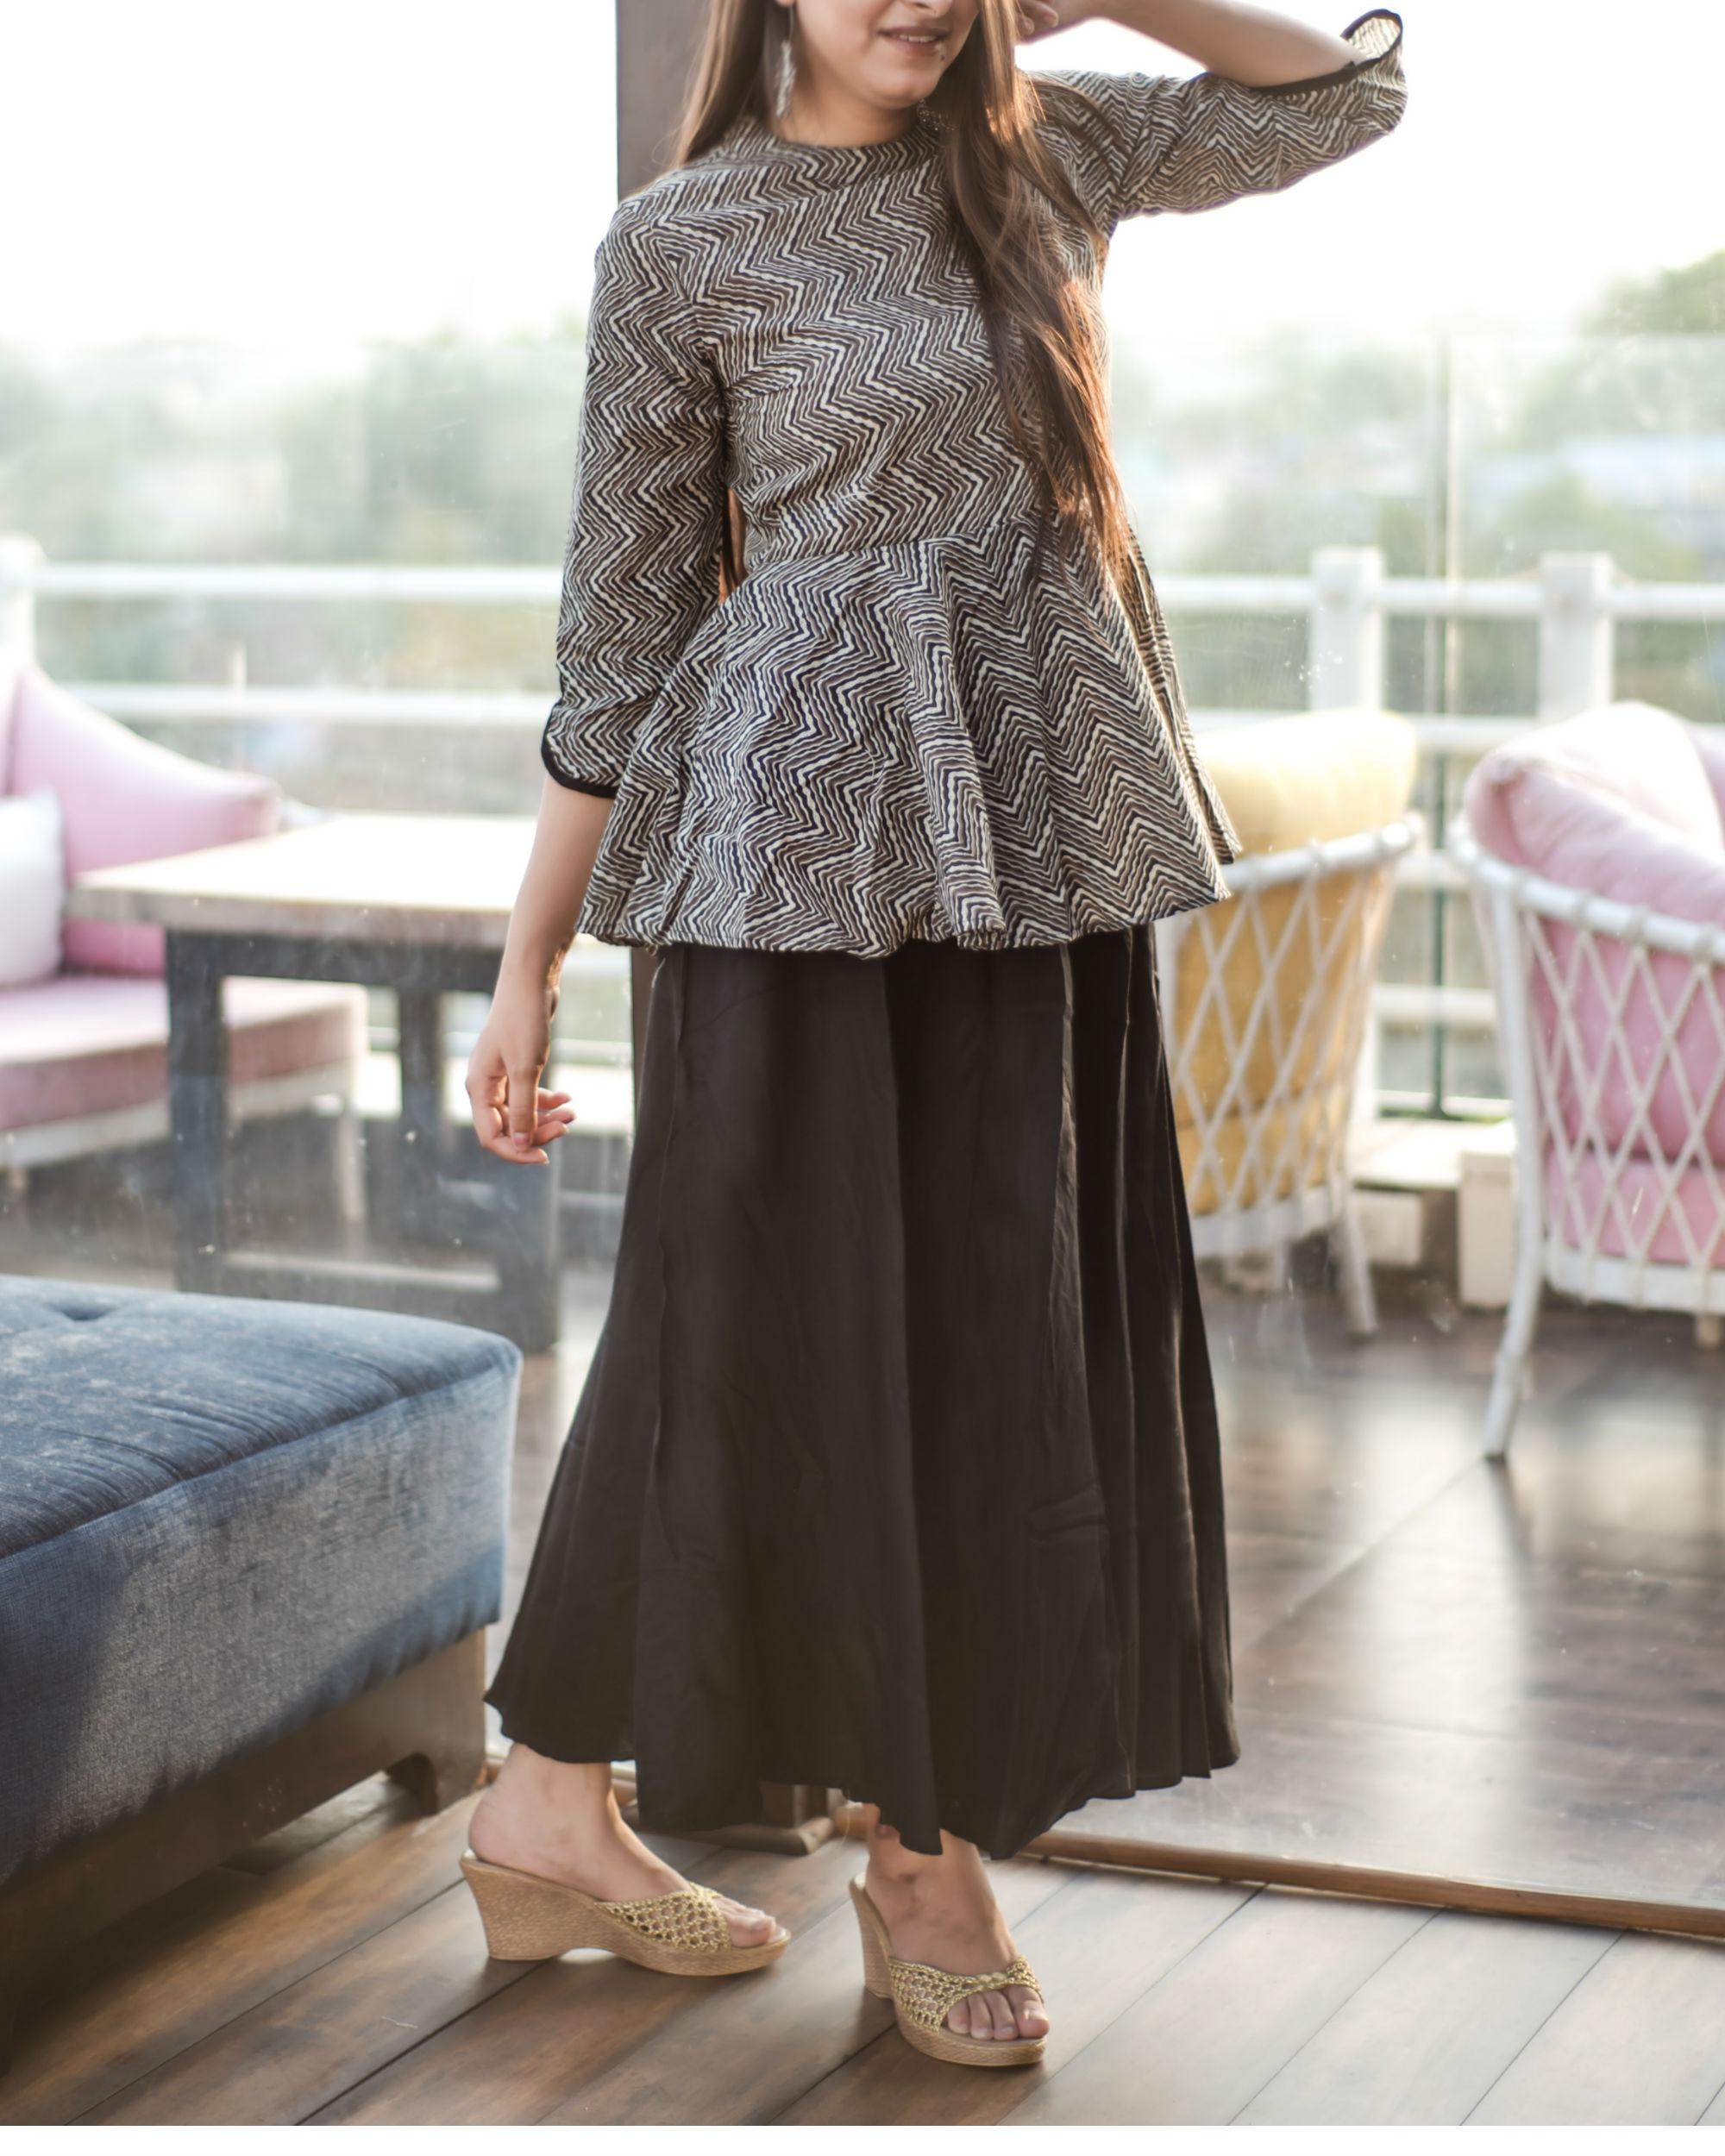 75f3c3457f453 Black and off-white peplum dress by Label Harsha Khatry